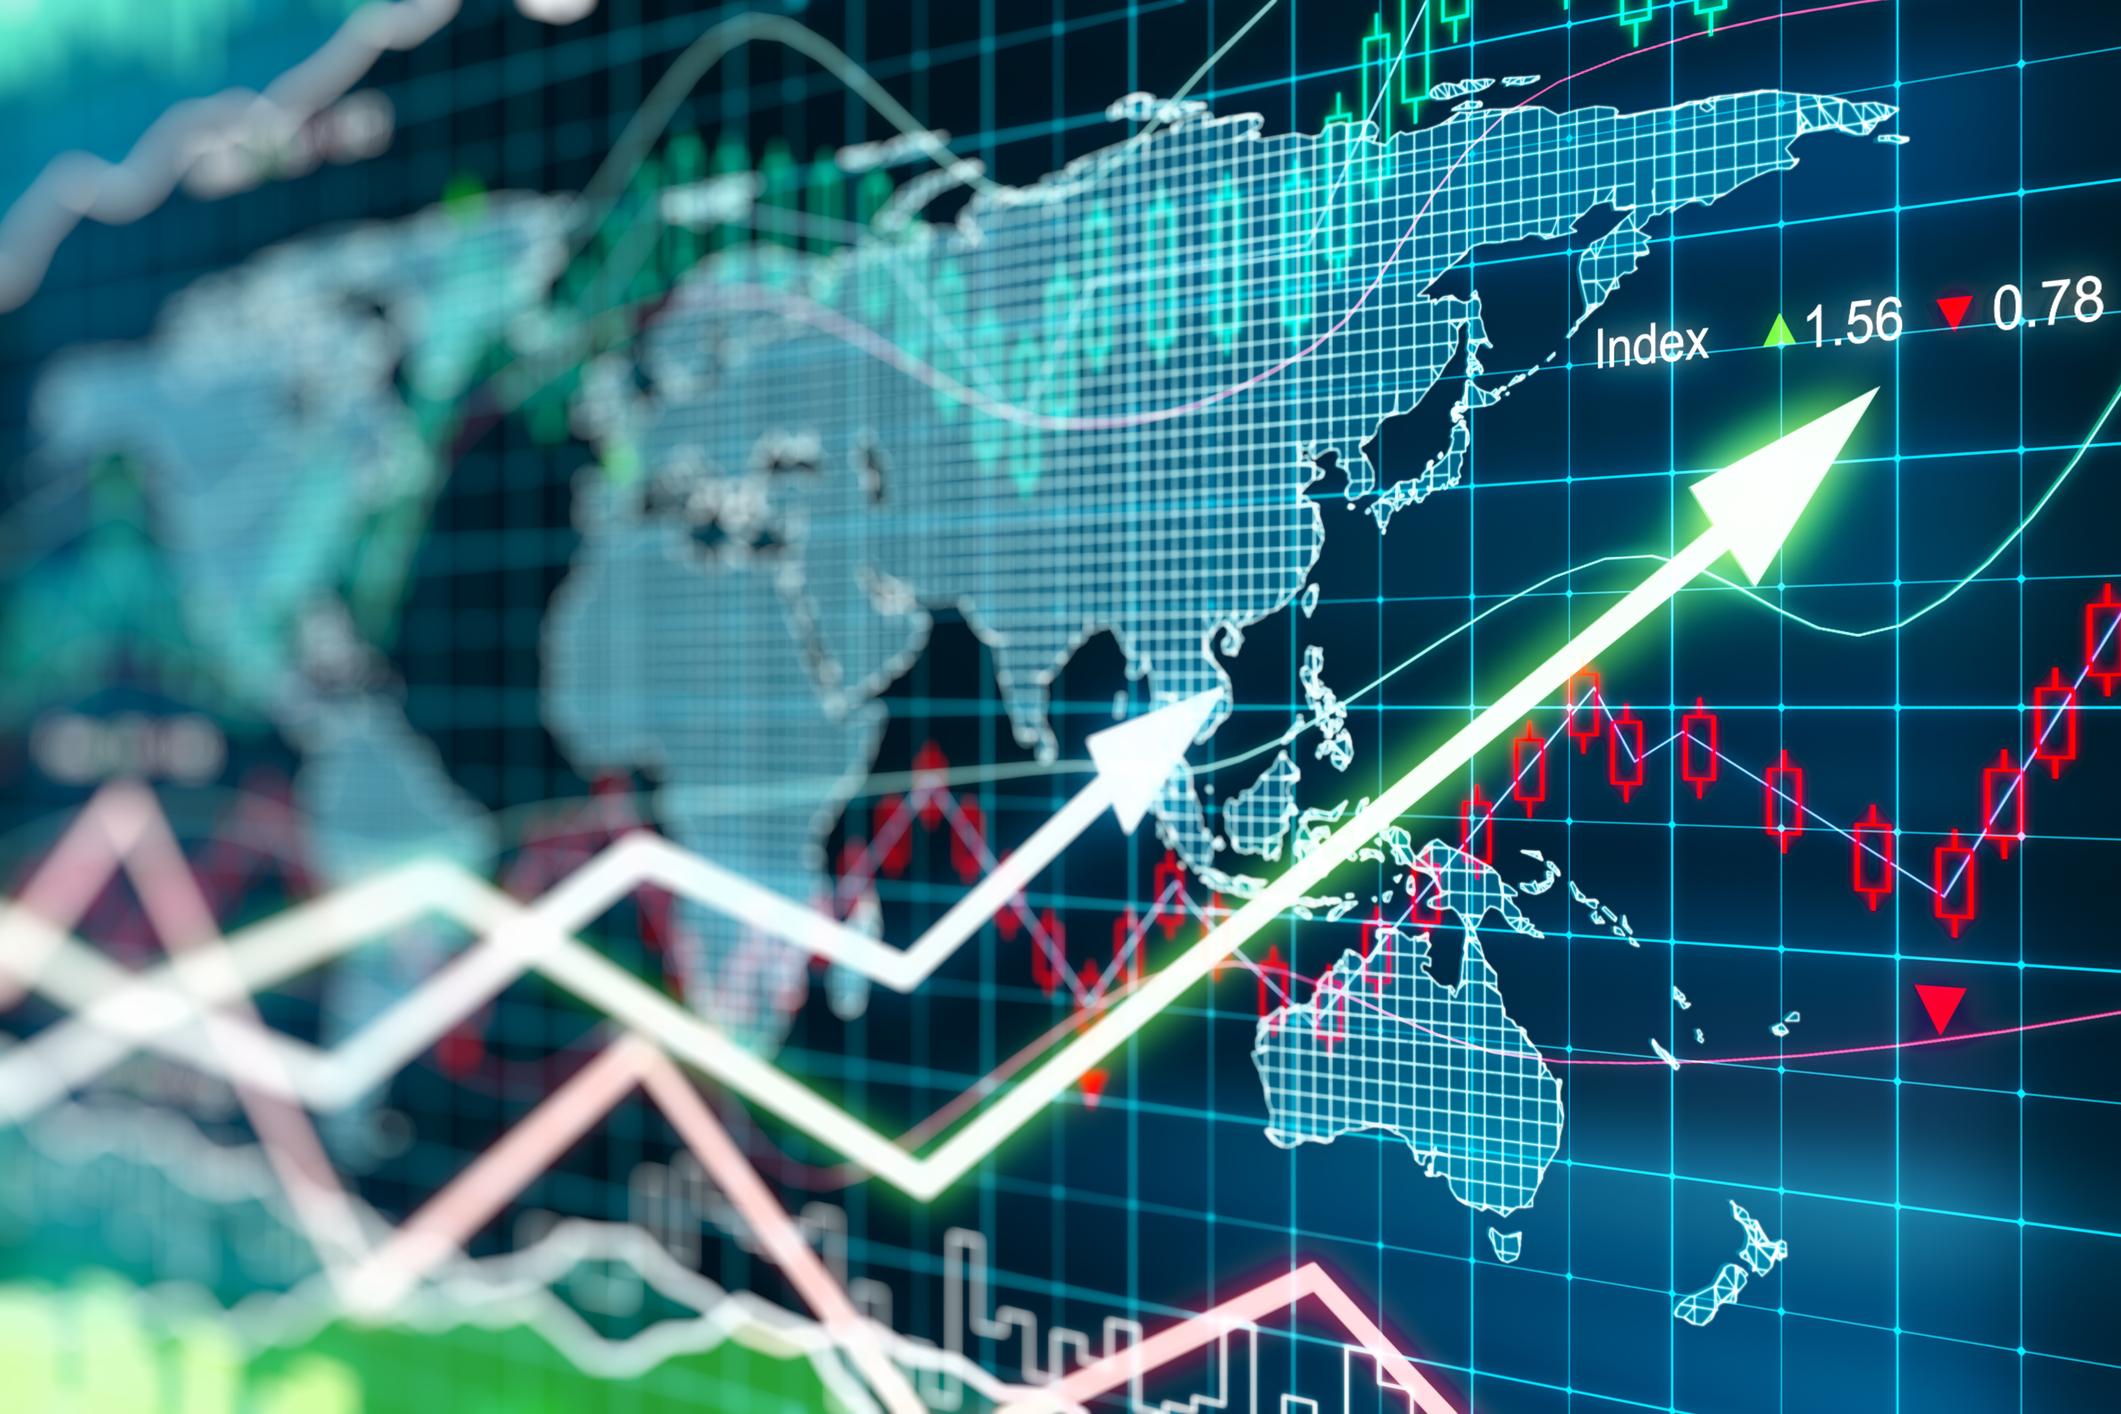 Rising stock chart on digital map of world